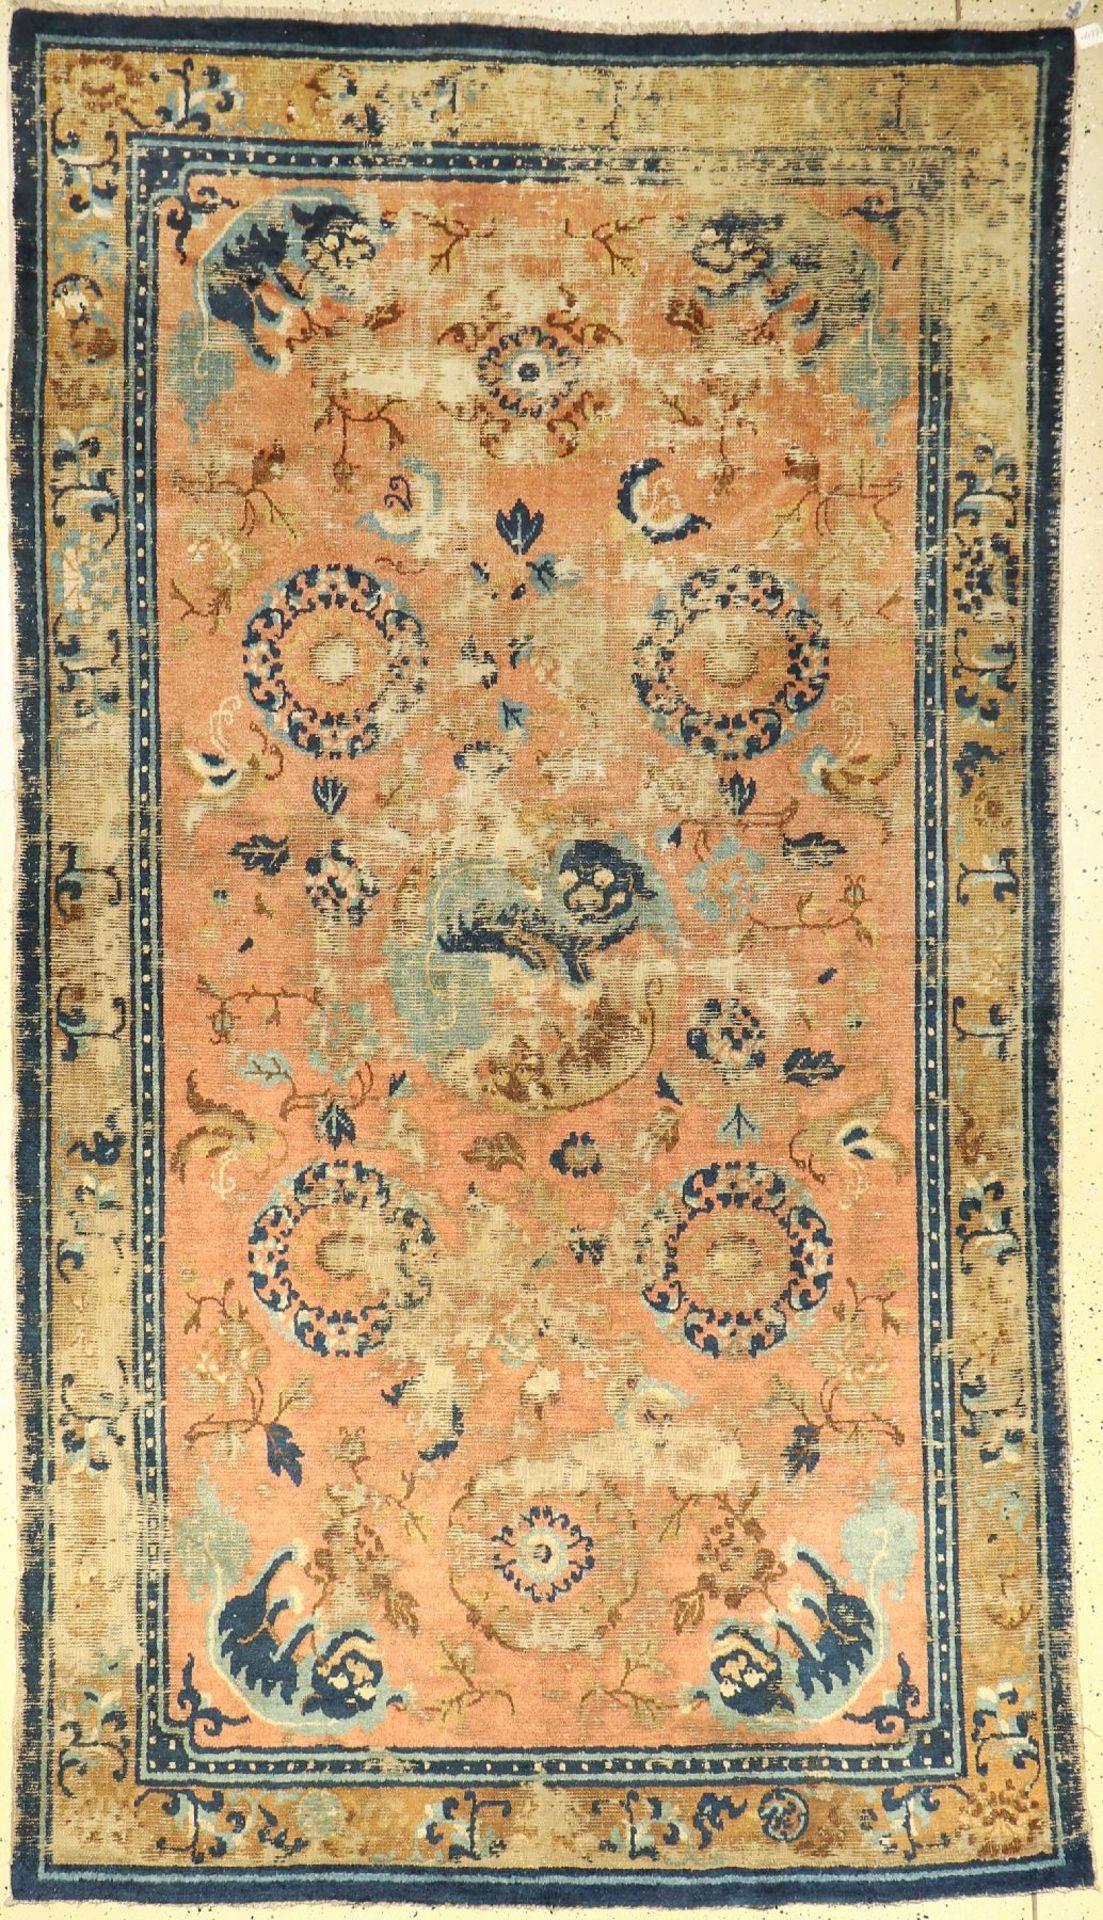 Früher Ning-Hsia antik, China, (Fo-Hunde), 18.Jhd., Wolle auf Baumwolle, ca. 278 x 156 cm, EHZ: